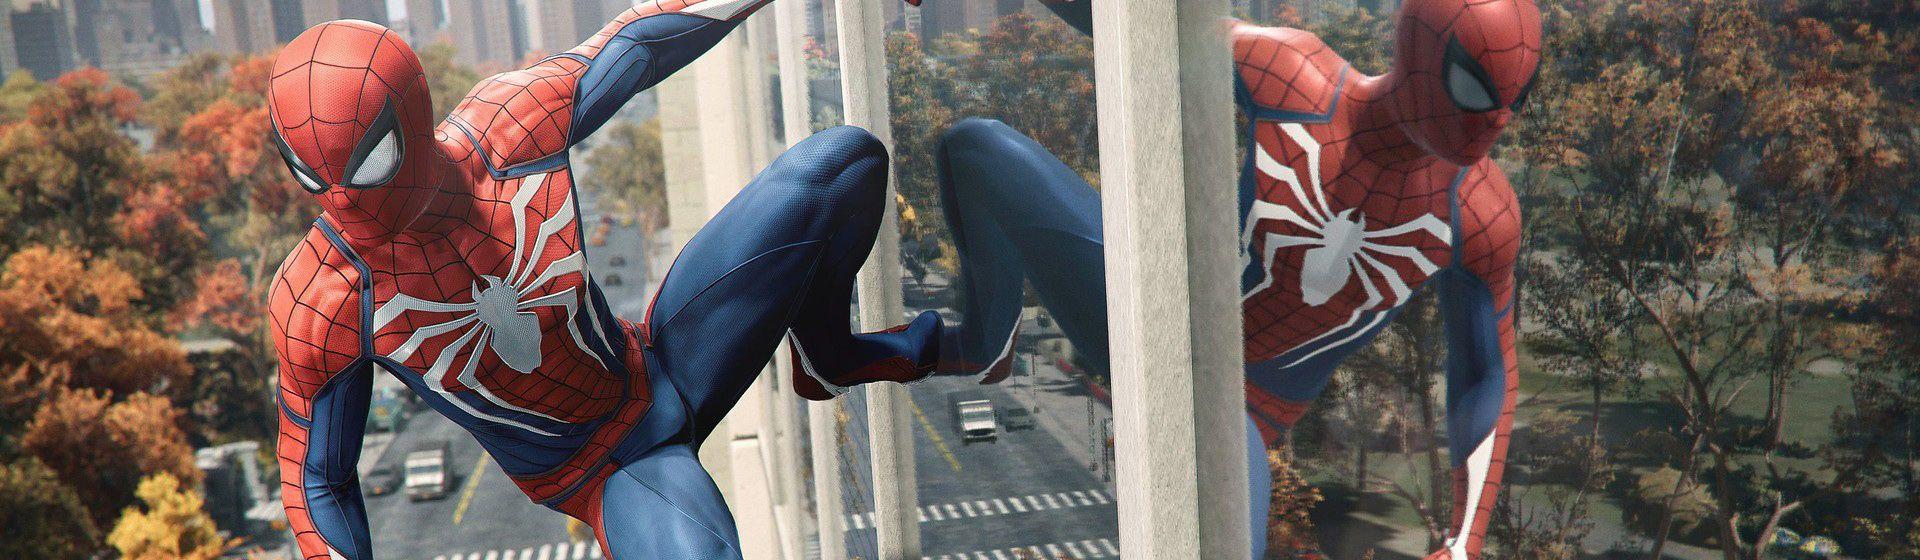 Spider-Man Remastered recebe vídeo com novo Peter Parker no PS5